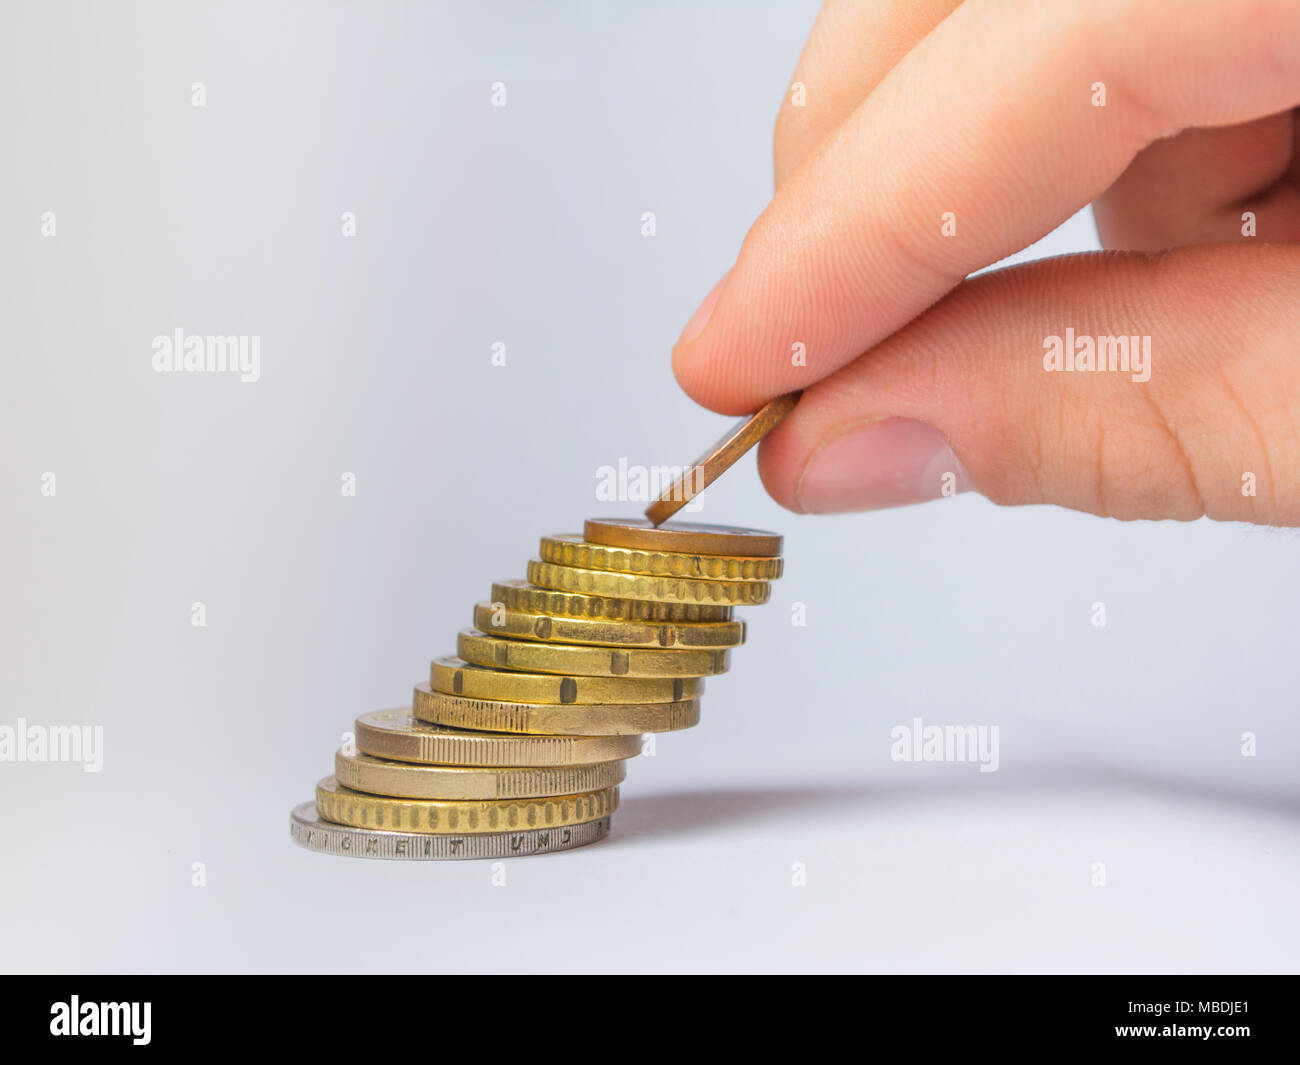 Saving money concept. - Stock Image